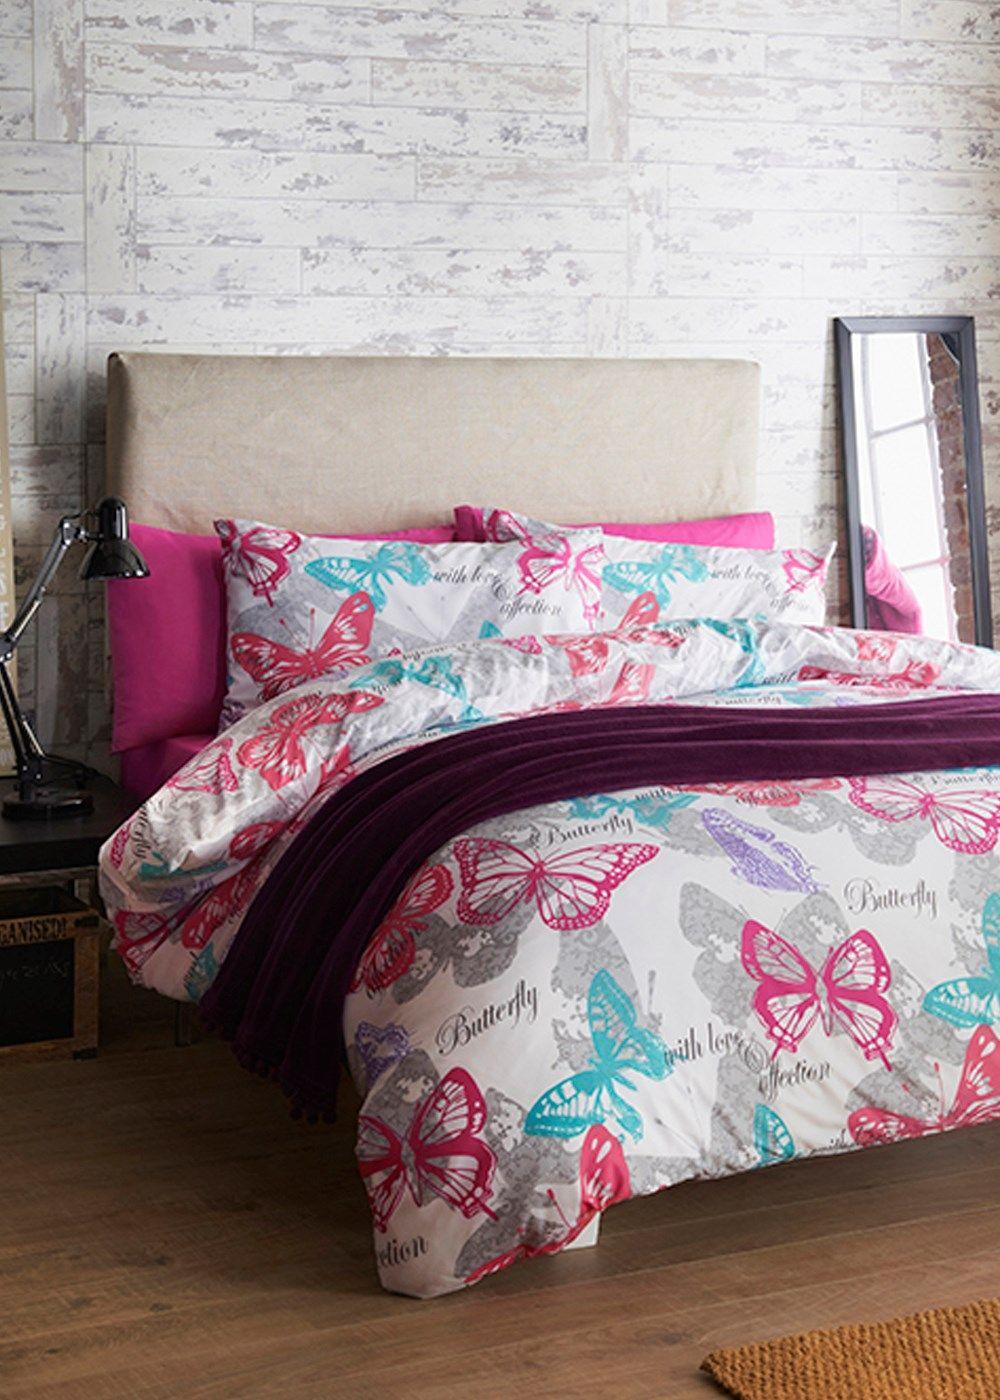 Butterfly Motif Print Duvet Set Matalan Bedrooms For Me - Matalan bedroom furniture